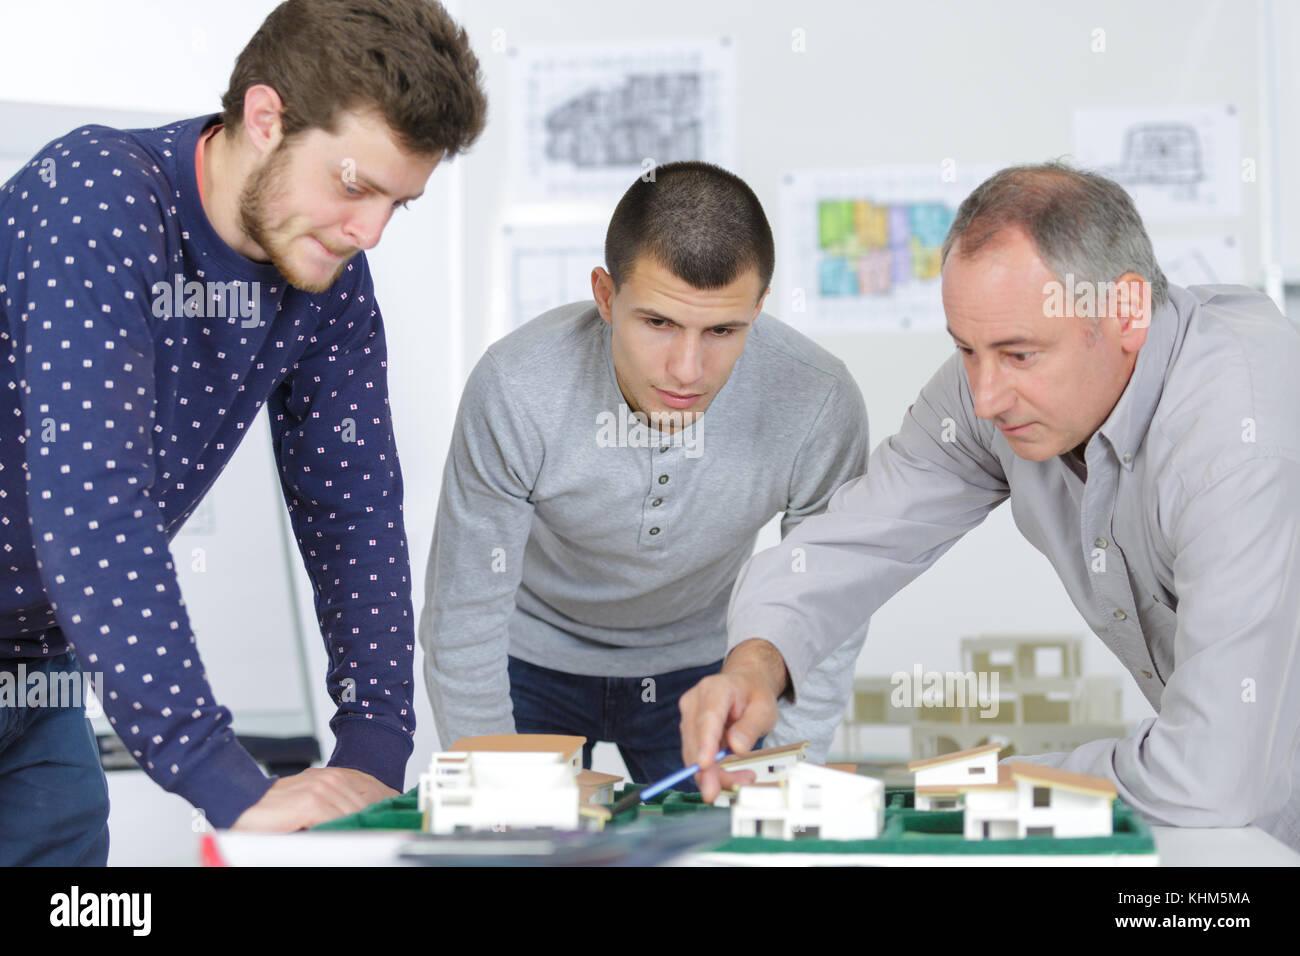 making house models - Stock Image